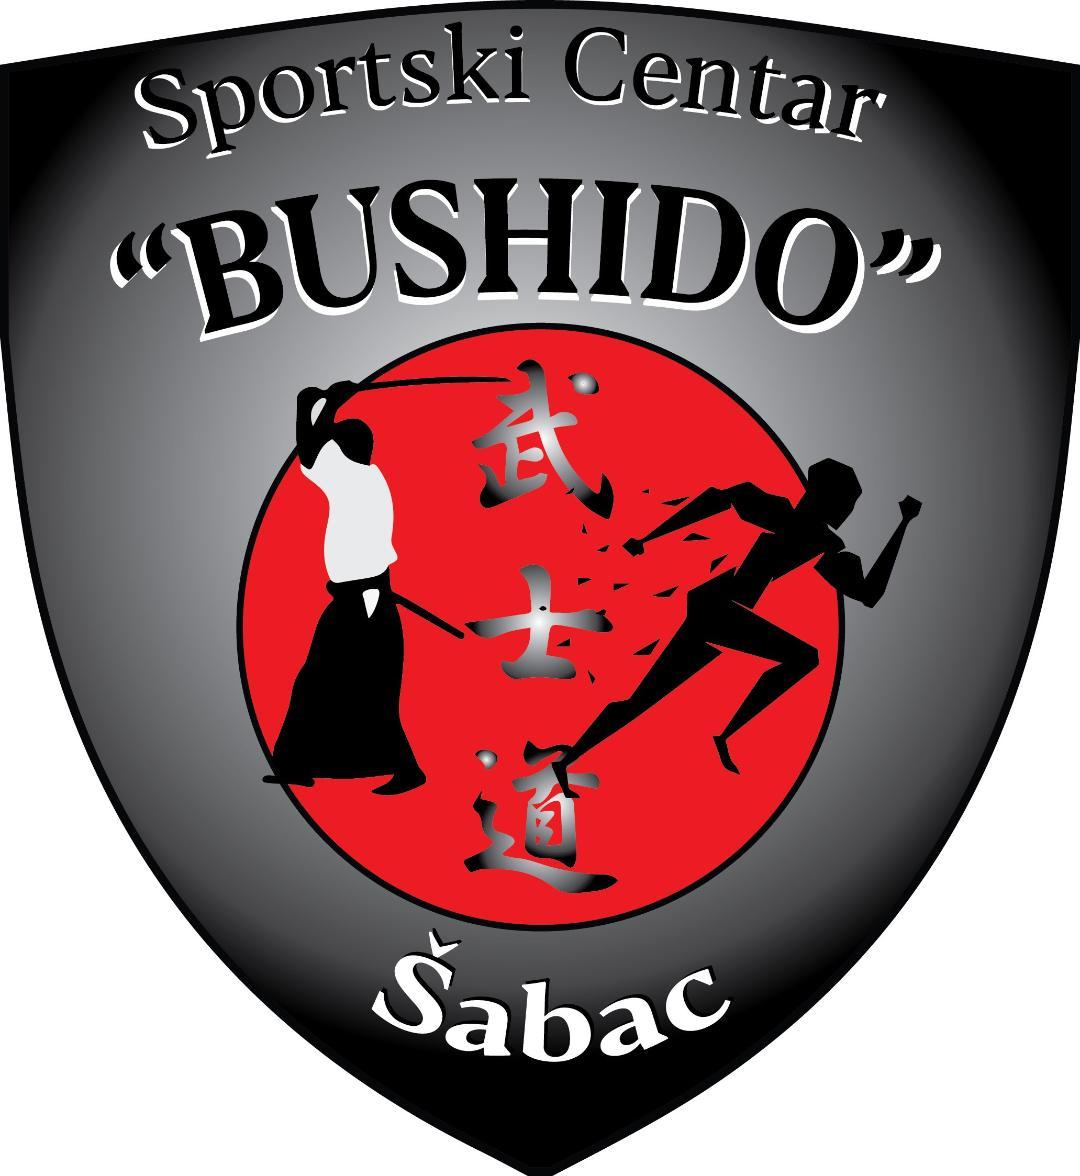 Bushido, Šabac